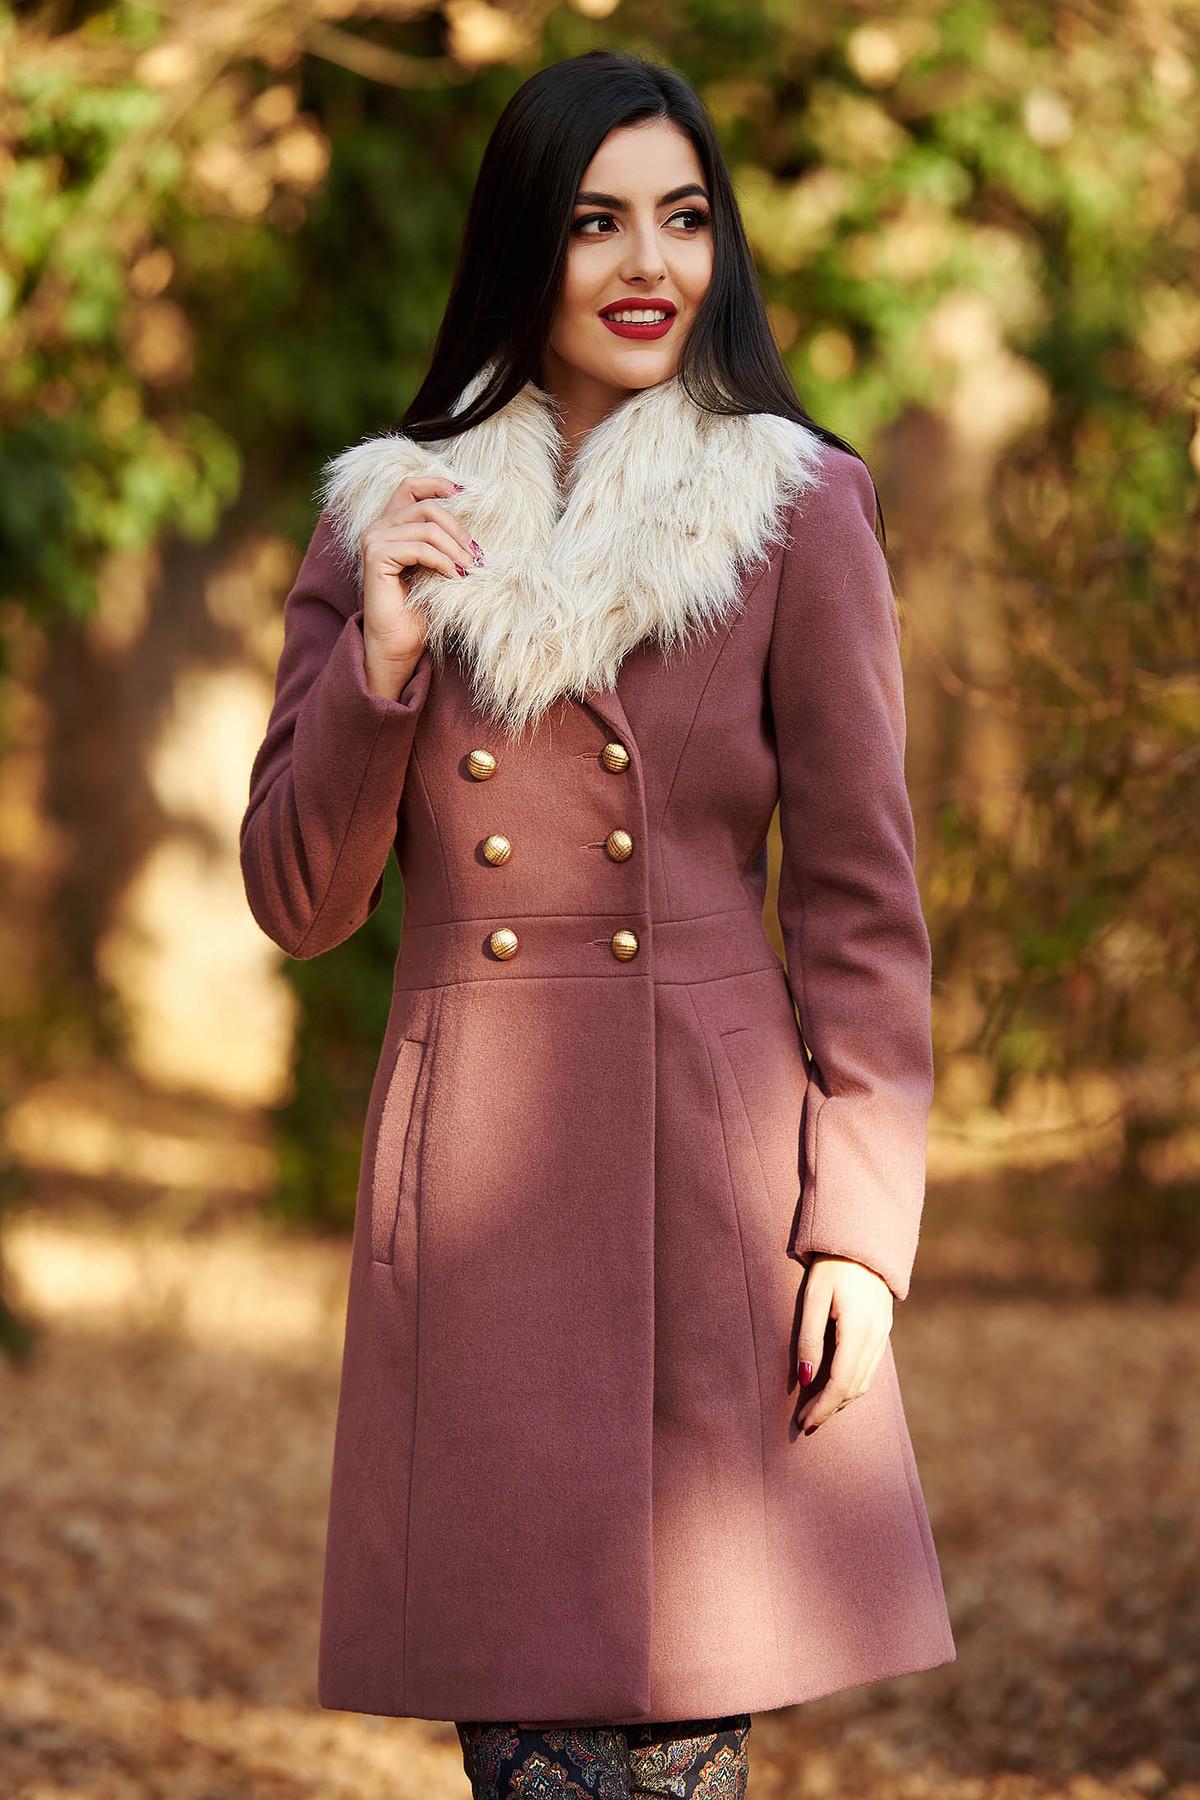 Palton StarShinerS mov elegant cu un croi cambrat din lana captusit pe interior cu guler din blana si buzunare